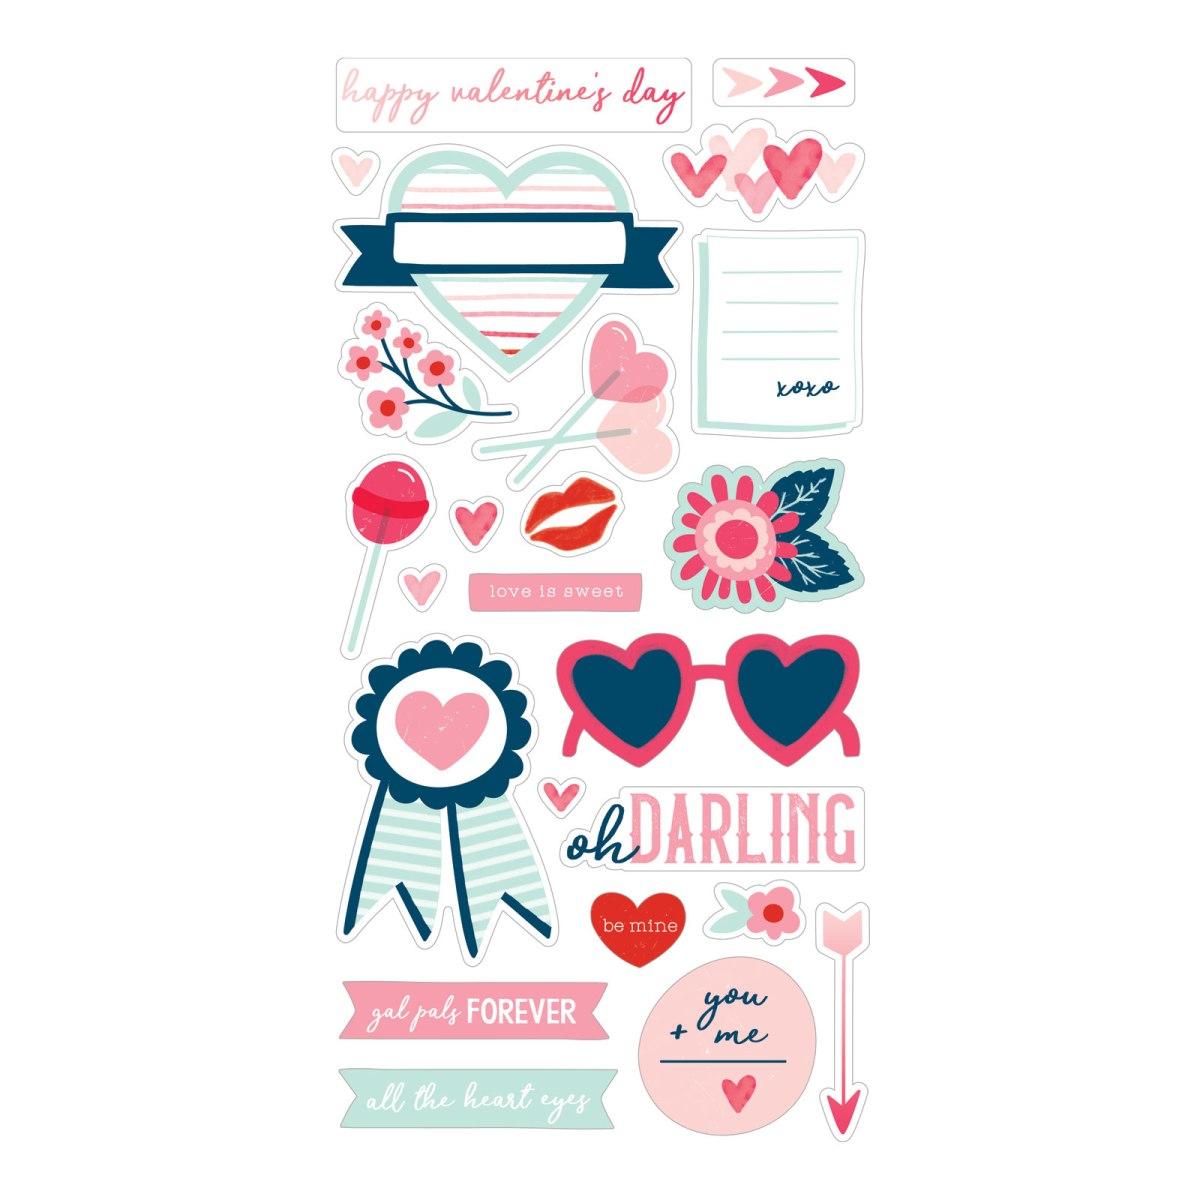 Heart Happy After Valentine's Day #ctmh #closetomyheart #ctmhhearthappy #everydaylife #minialbum #diyalbum #albuminstructions #free #freeguide #valentinesday #love #howto #scrapbooking #scrapbook #storytelling #everyday